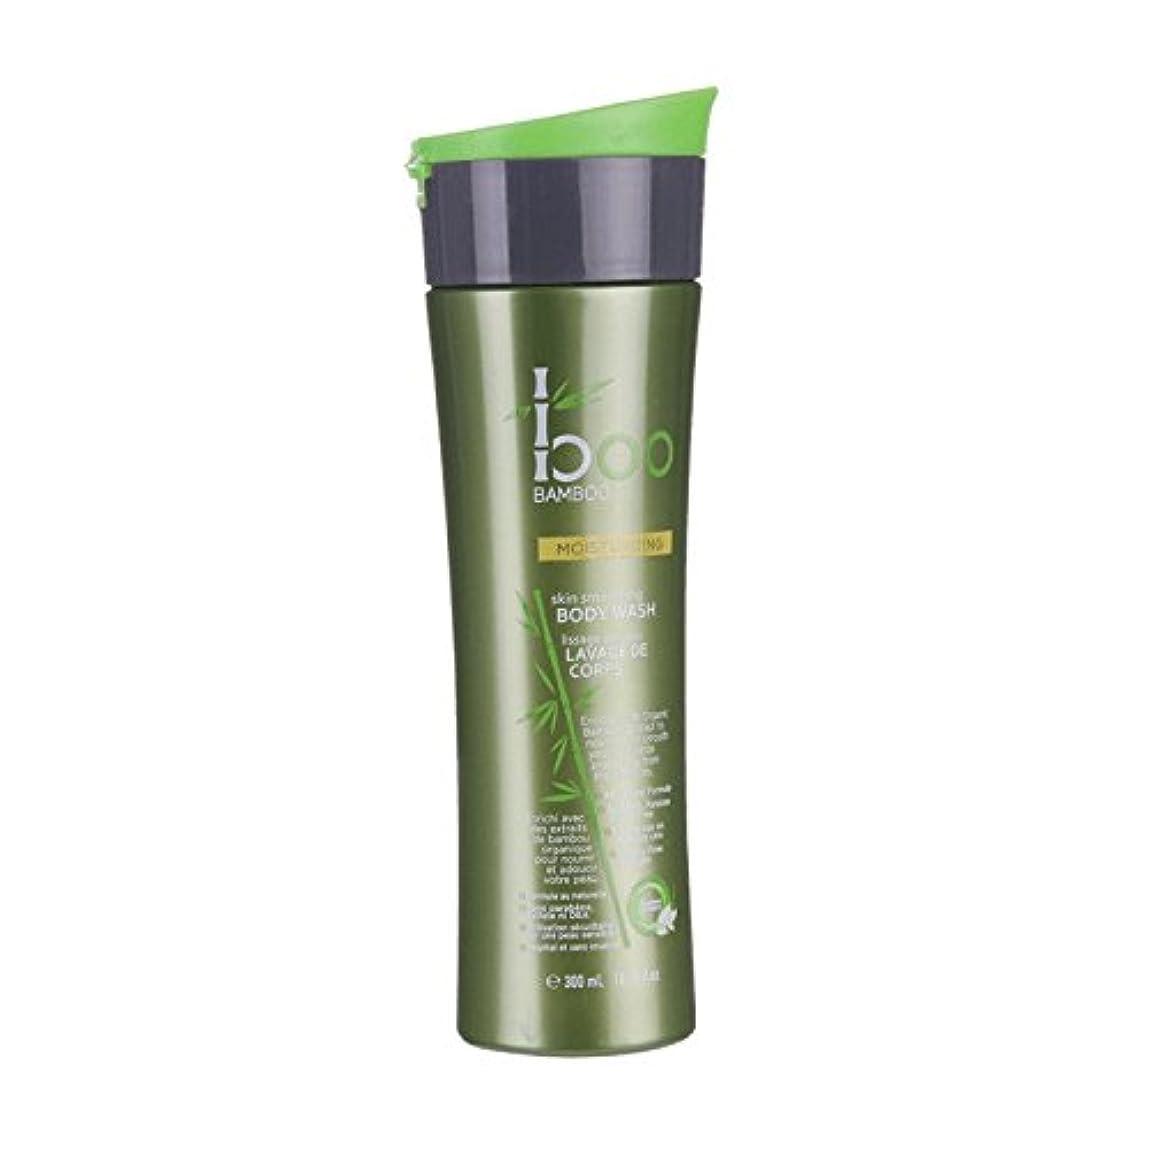 Boo Bamboo Moist Body Wash 300ml (Pack of 2) - 竹しっとりボディウォッシュ300ミリリットルブーイング (x2) [並行輸入品]